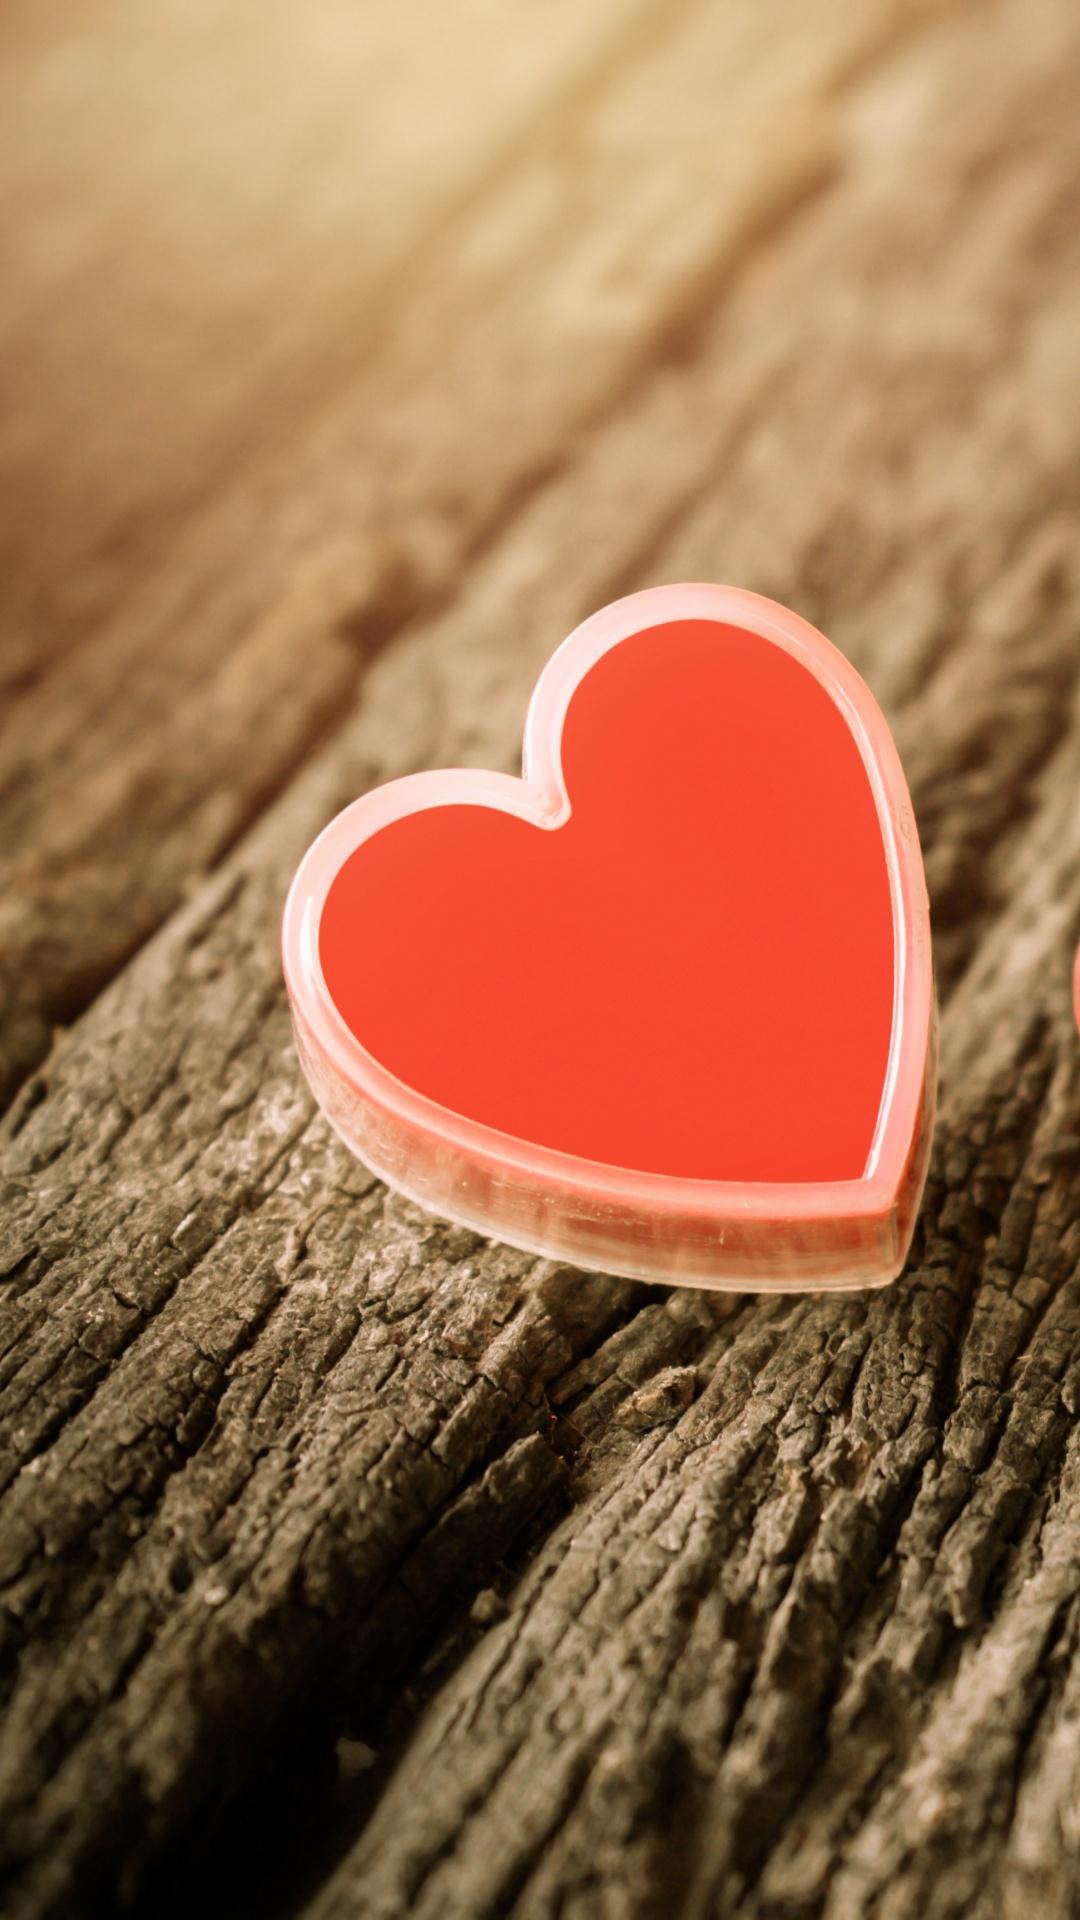 Pink Love Vintage Heart - Mobile Love Wallpaper Hd 1080p - HD Wallpaper